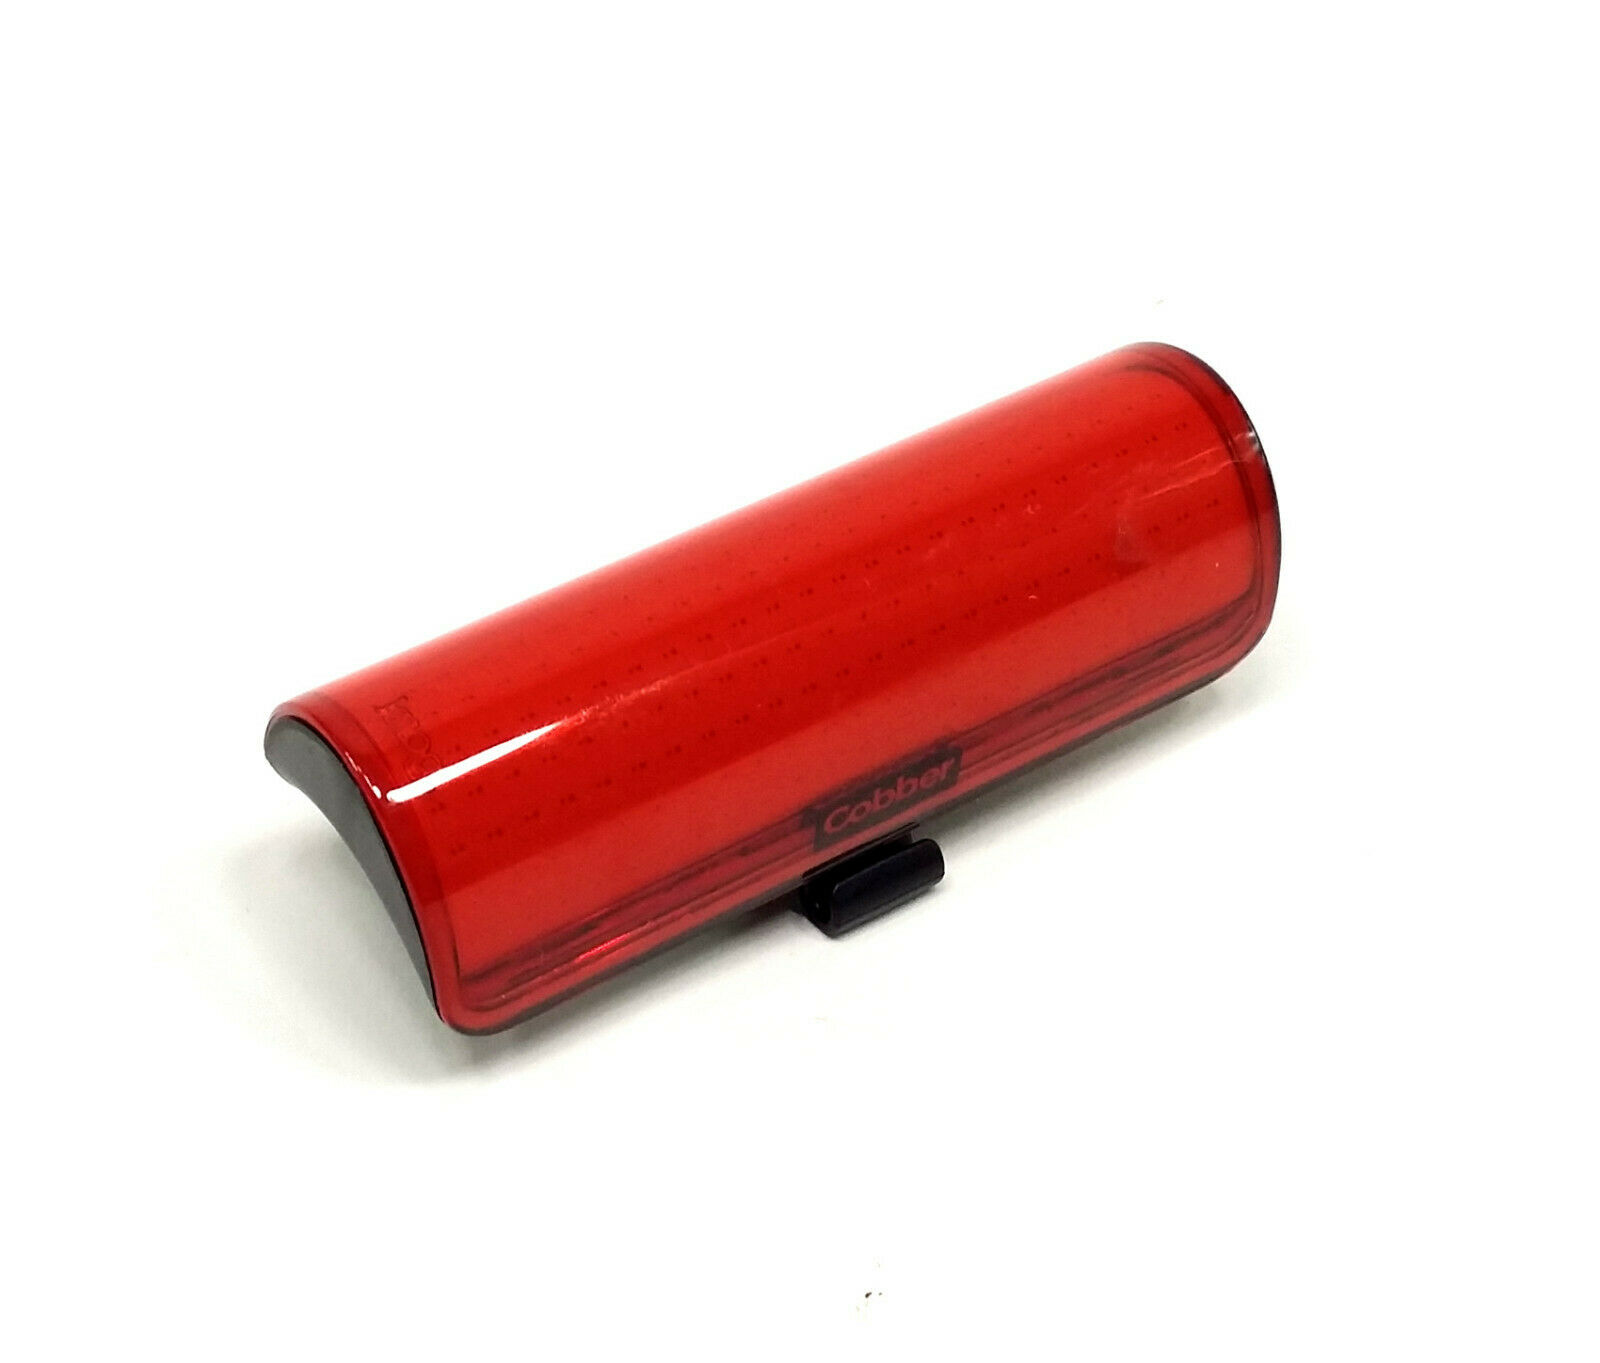 Knog Big Cobber Rear Bike Light 270 Lumens 330 d Visibility USB Rechargeable